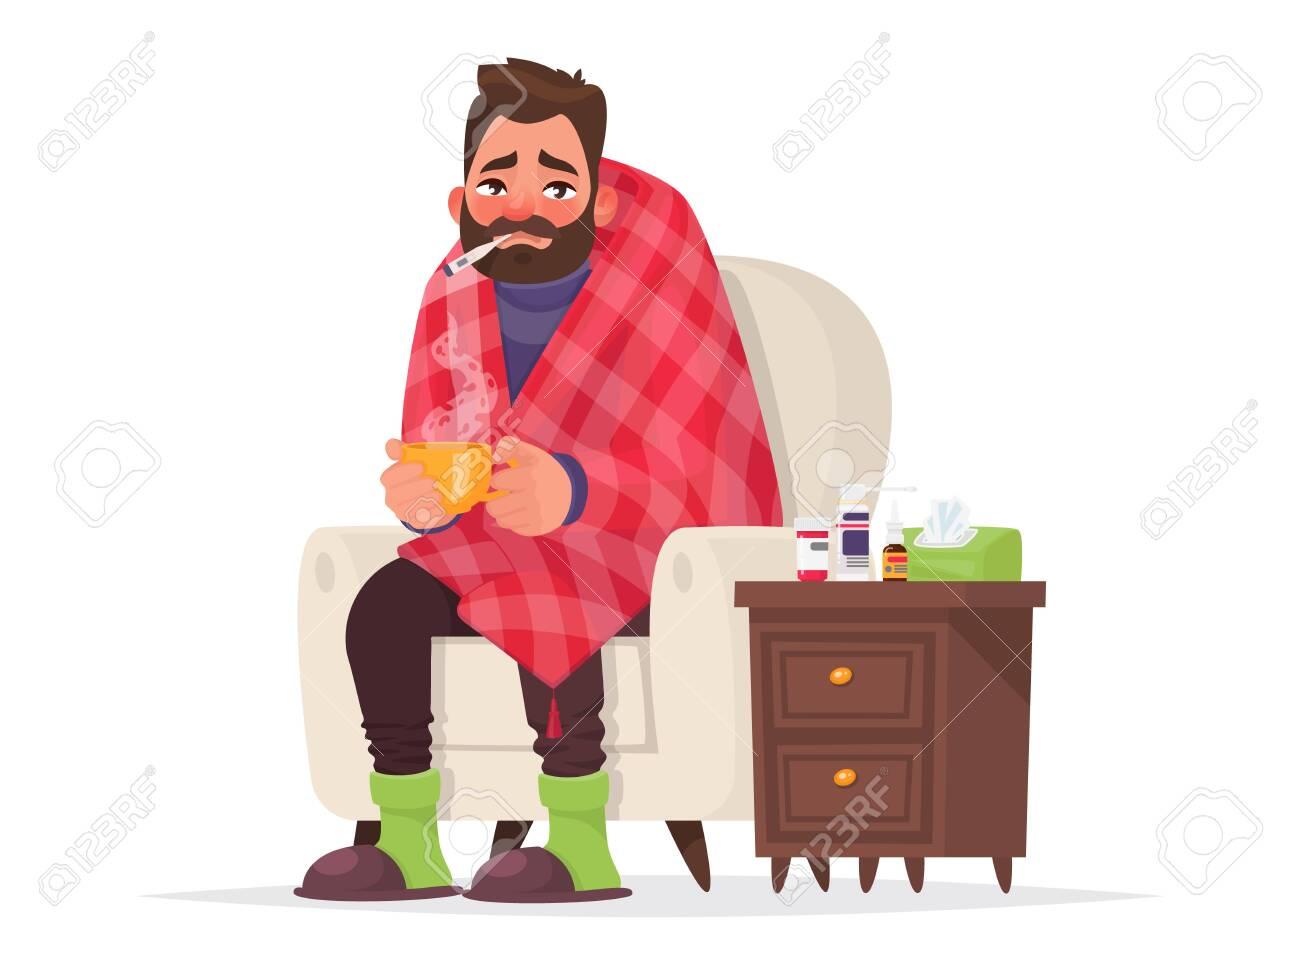 Sick man. Flu, viral disease. Illustration in cartoon style - 134077439